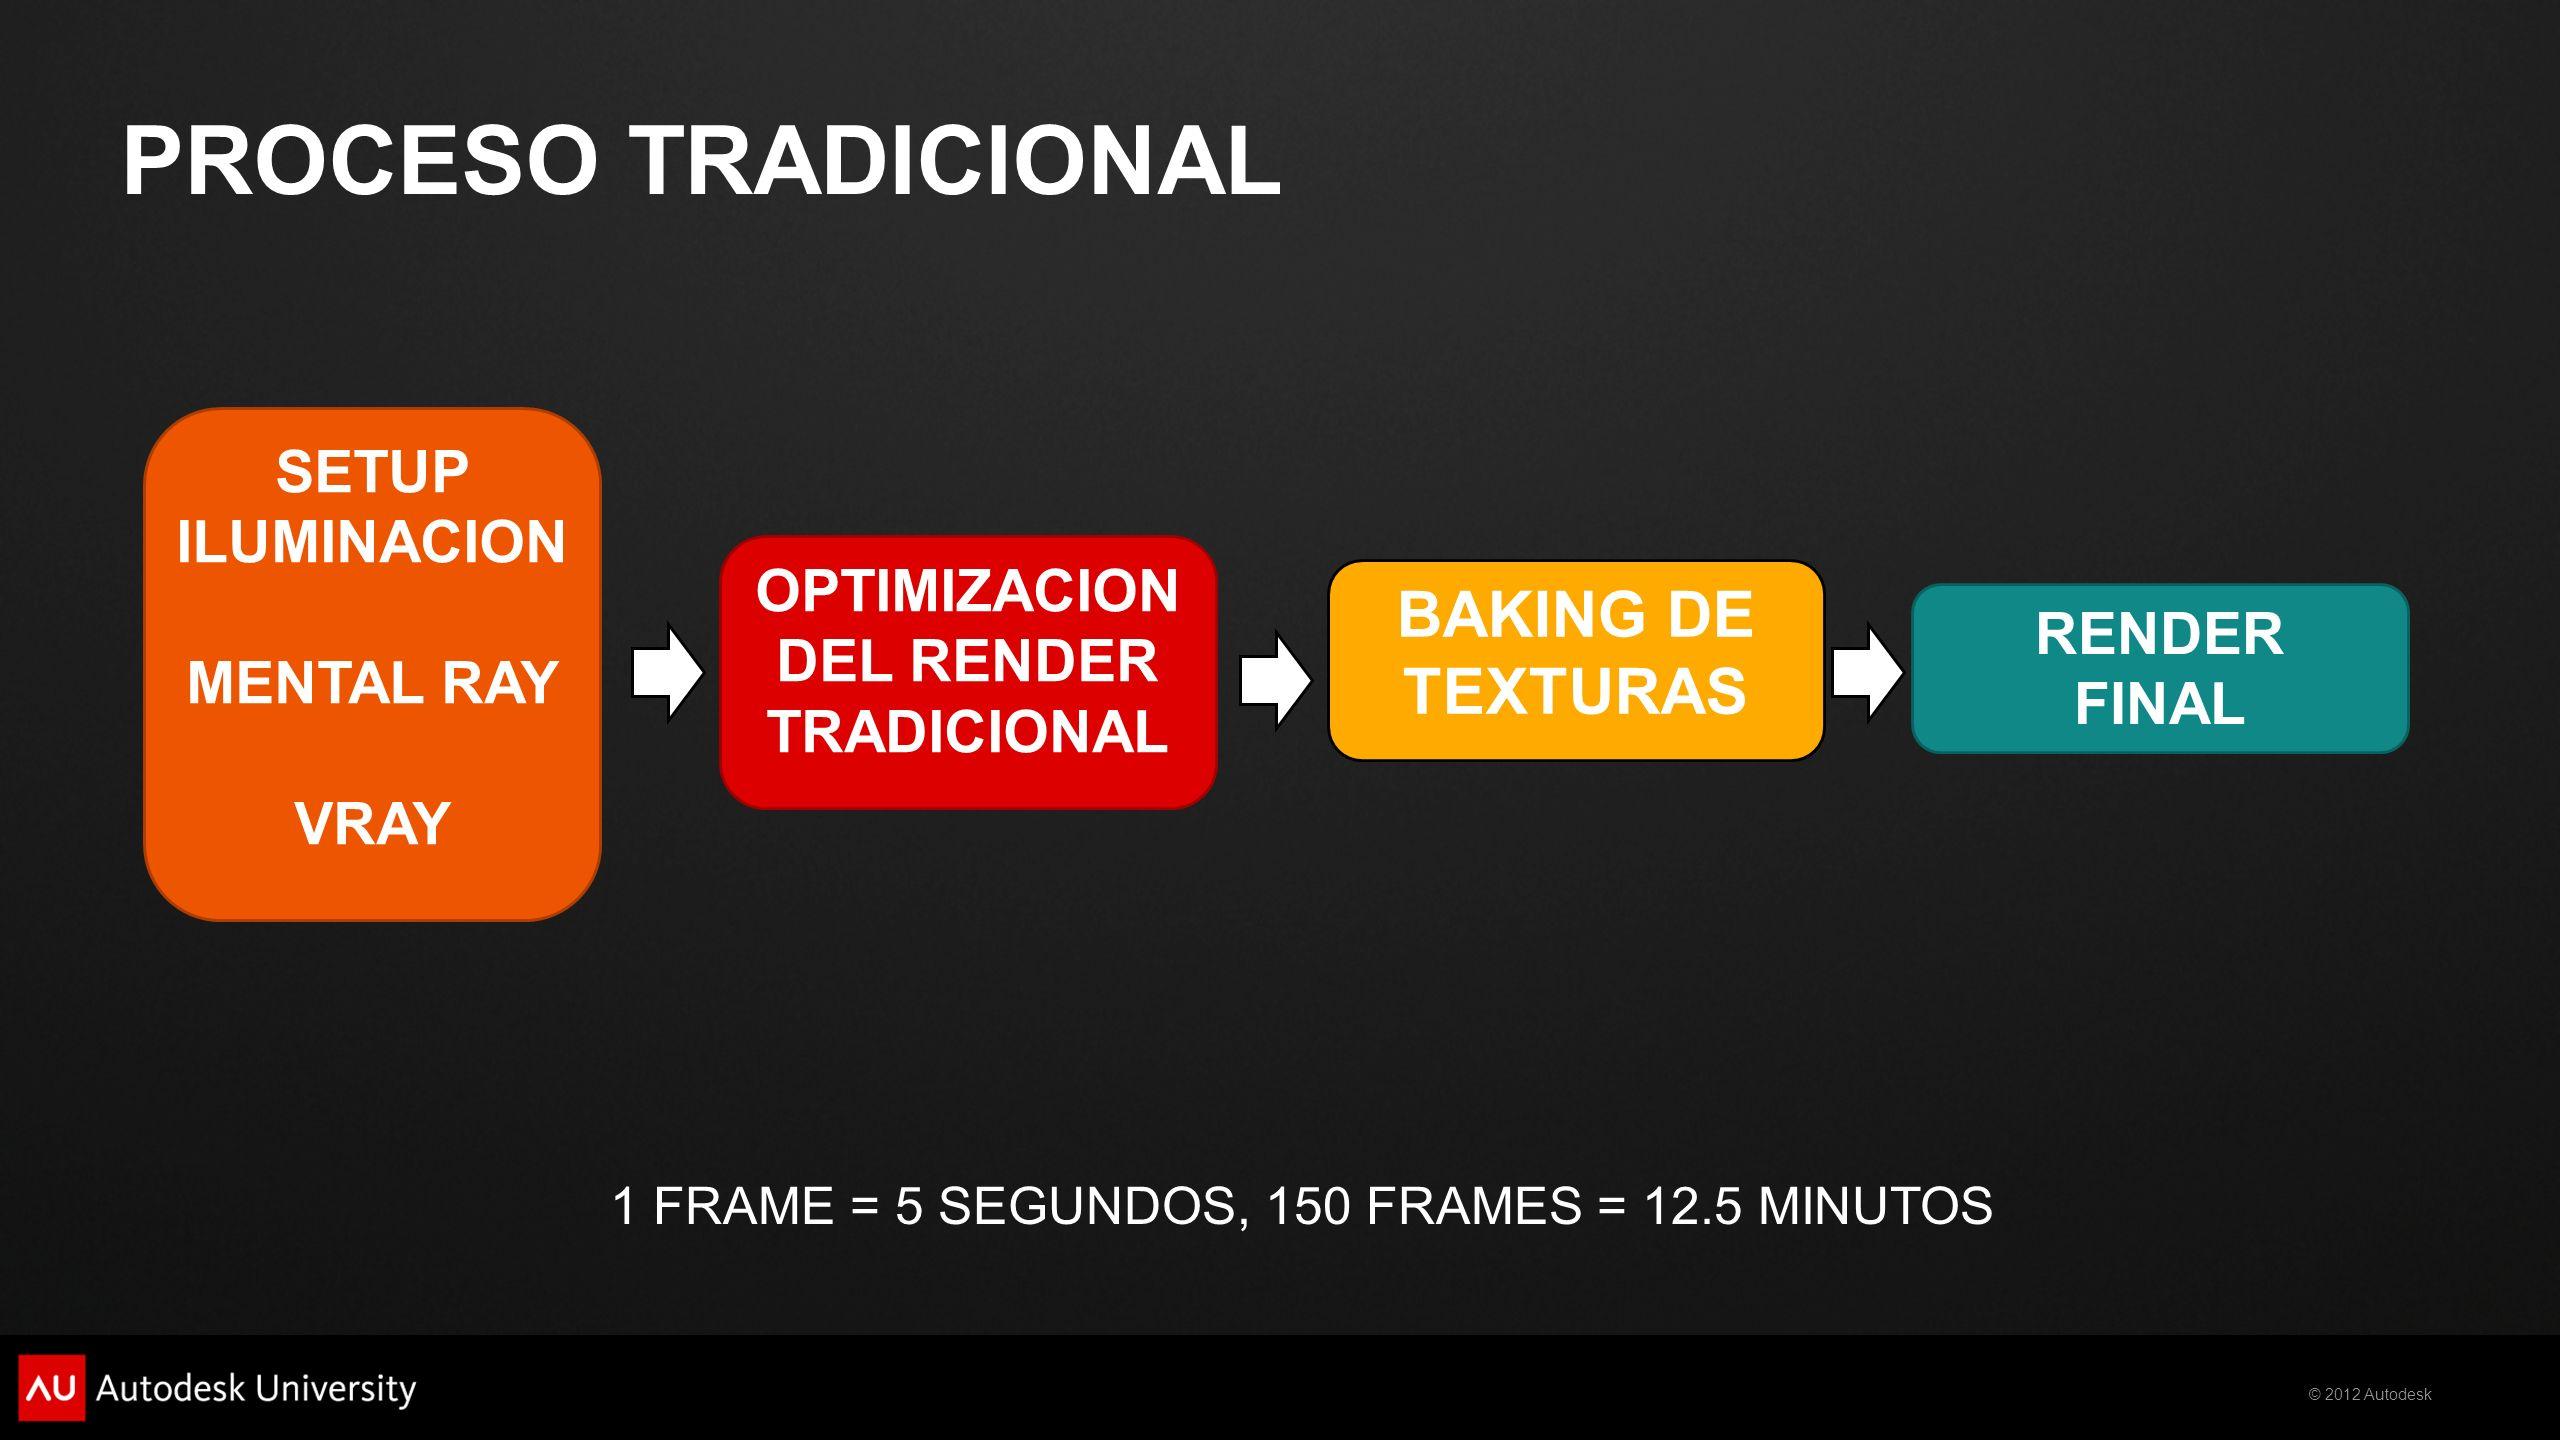 © 2012 Autodesk PROCESO TRADICIONAL SETUP ILUMINACION MENTAL RAY VRAY OPTIMIZACION DEL RENDER TRADICIONAL RENDER FINAL 1 FRAME = 5 SEGUNDOS, 150 FRAME